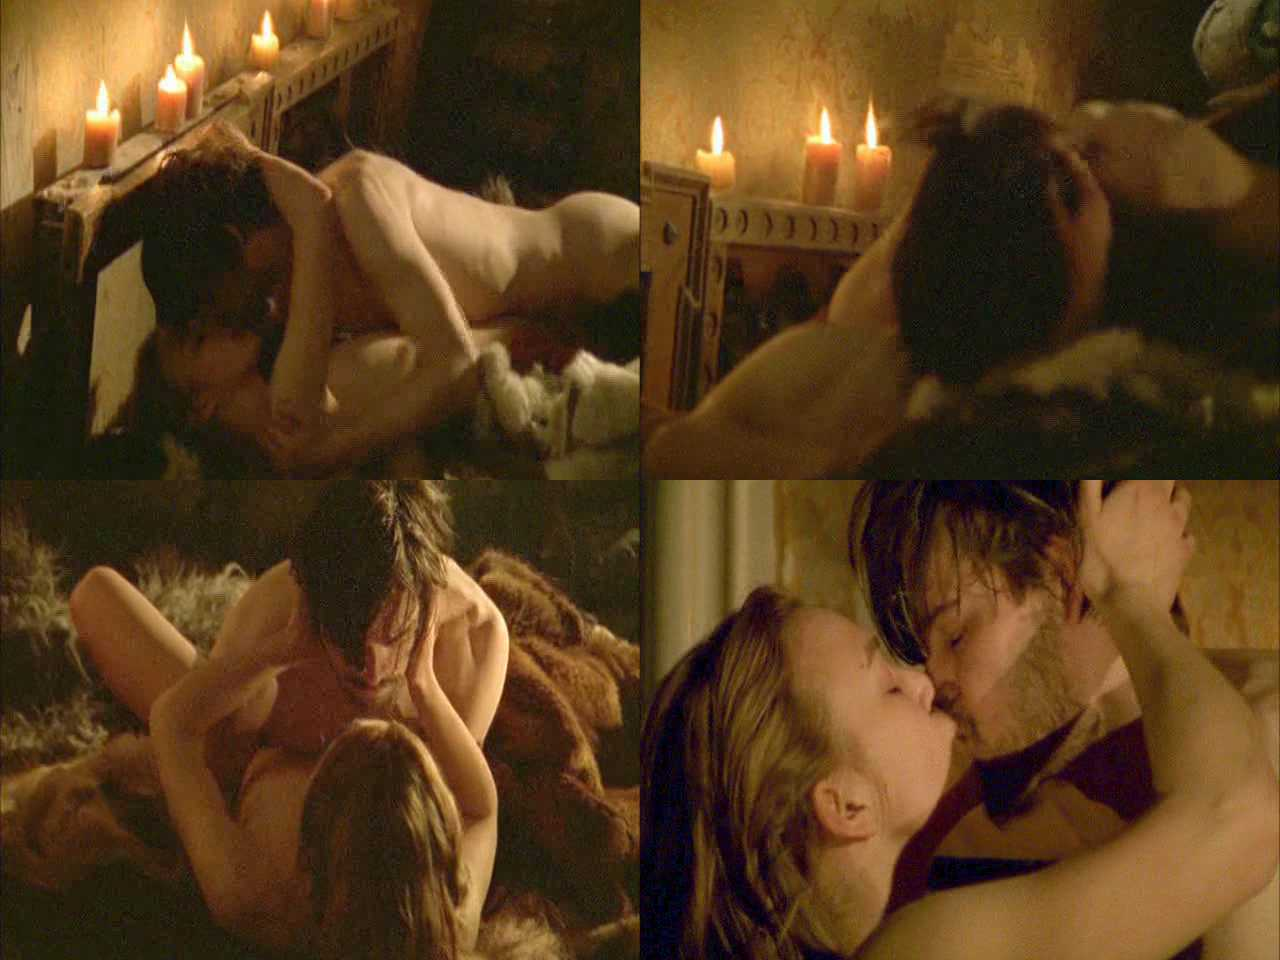 Keira knightley nude scene